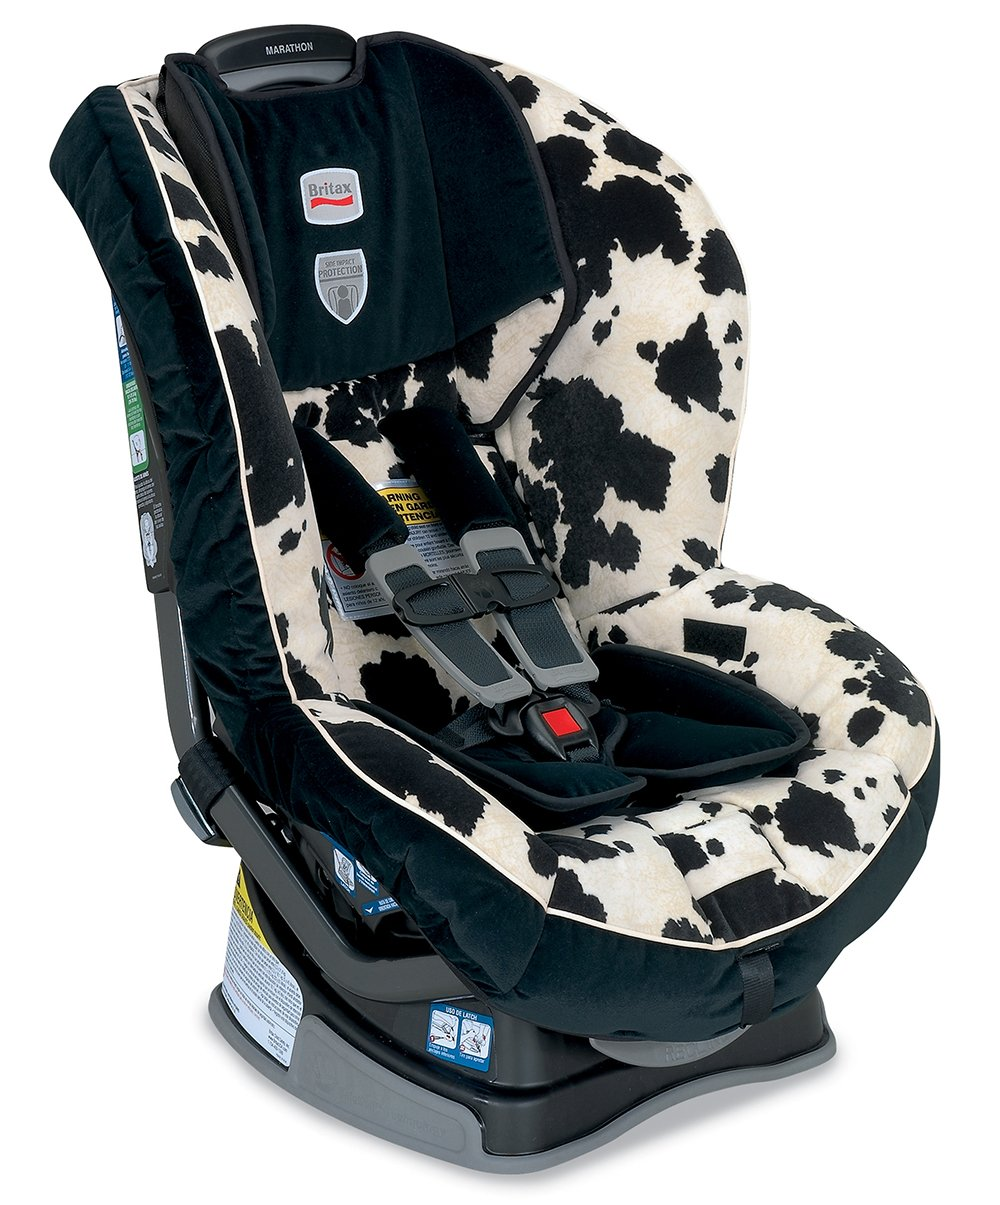 Amazon.com: Britax Marathon G4 Convertible Car Seat, Cowmooflage (Prior  Model): Baby